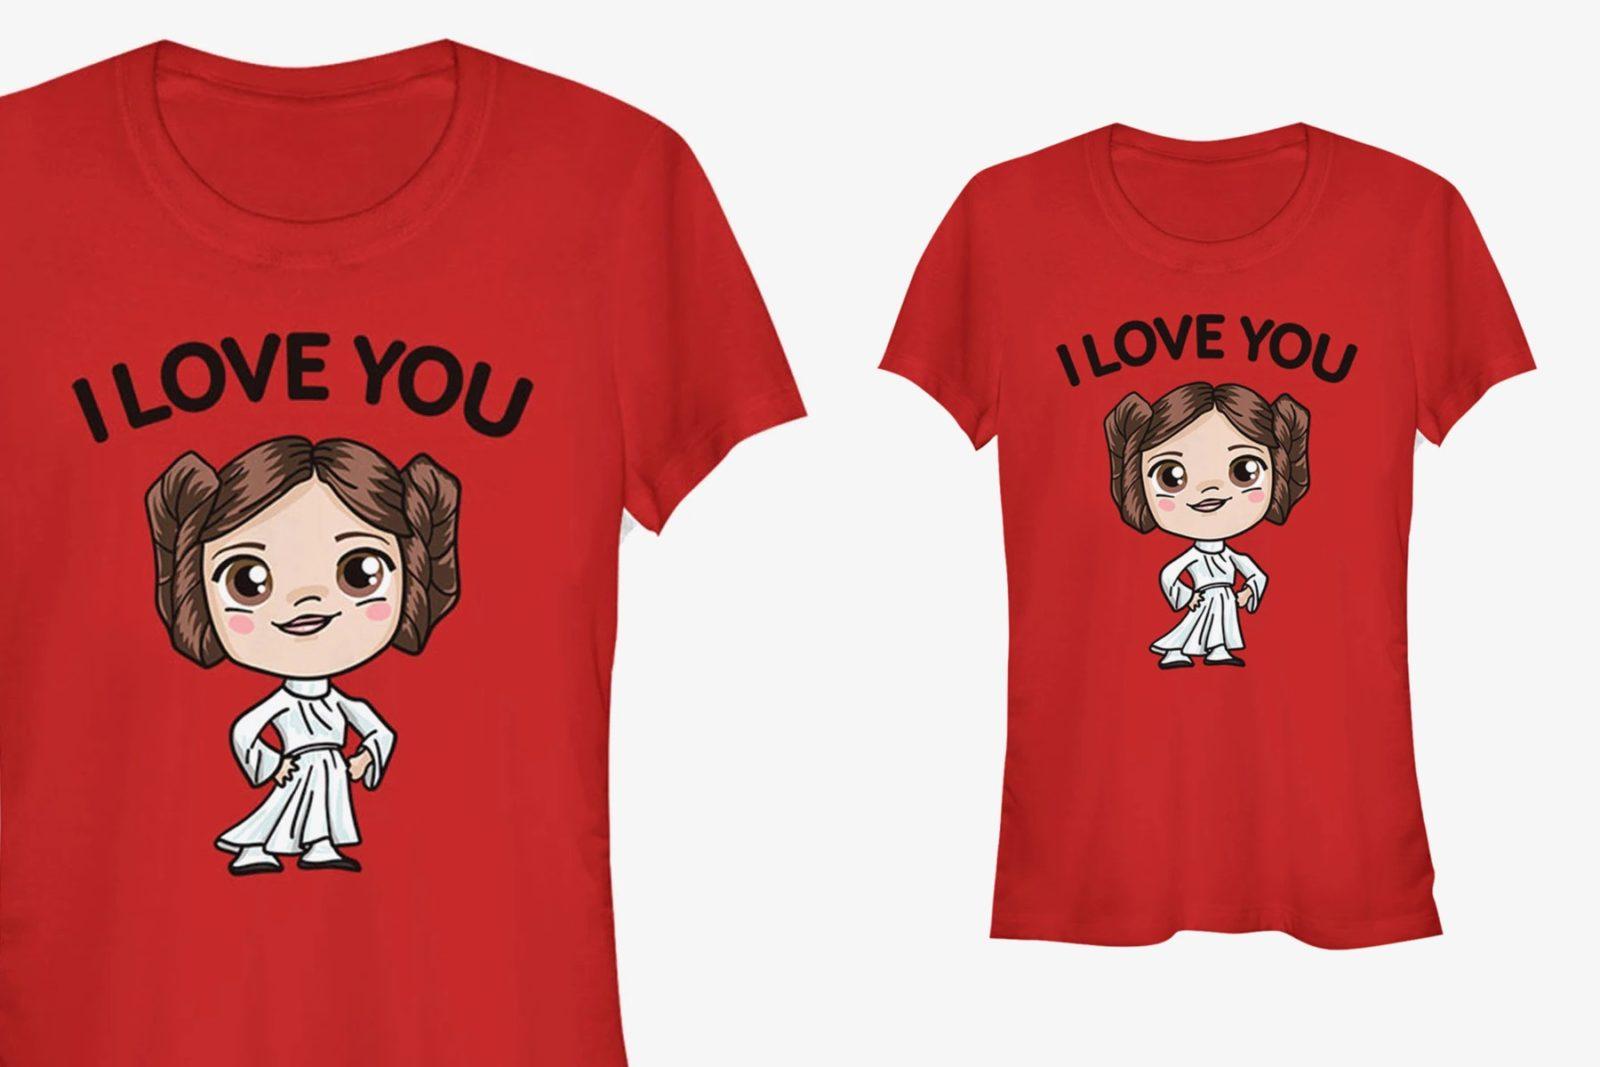 Women's Star Wars Princess Leia I Love You T-Shirt at Hot Topic